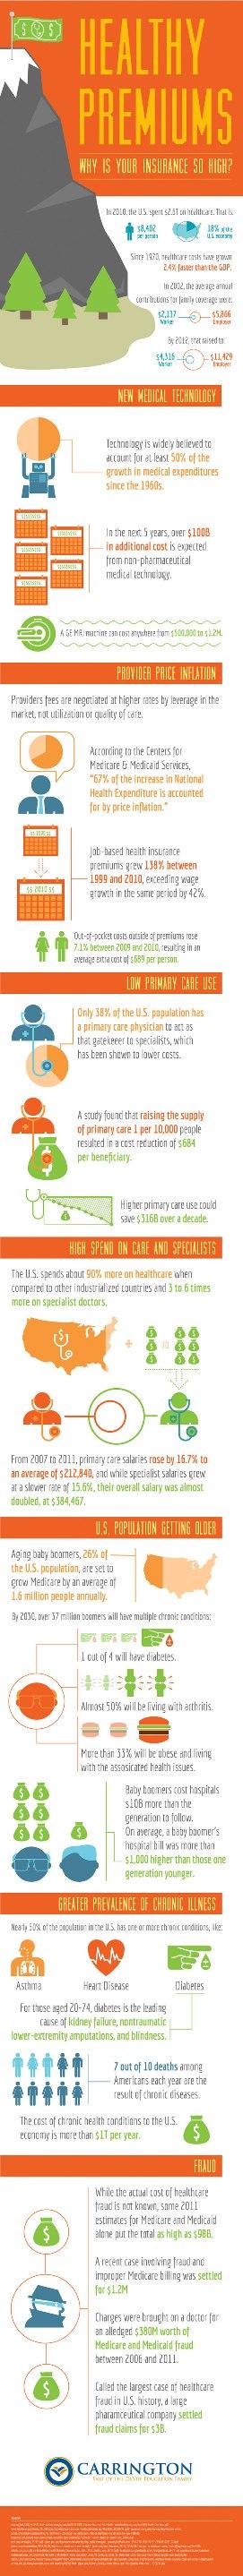 health-insurance-premiums